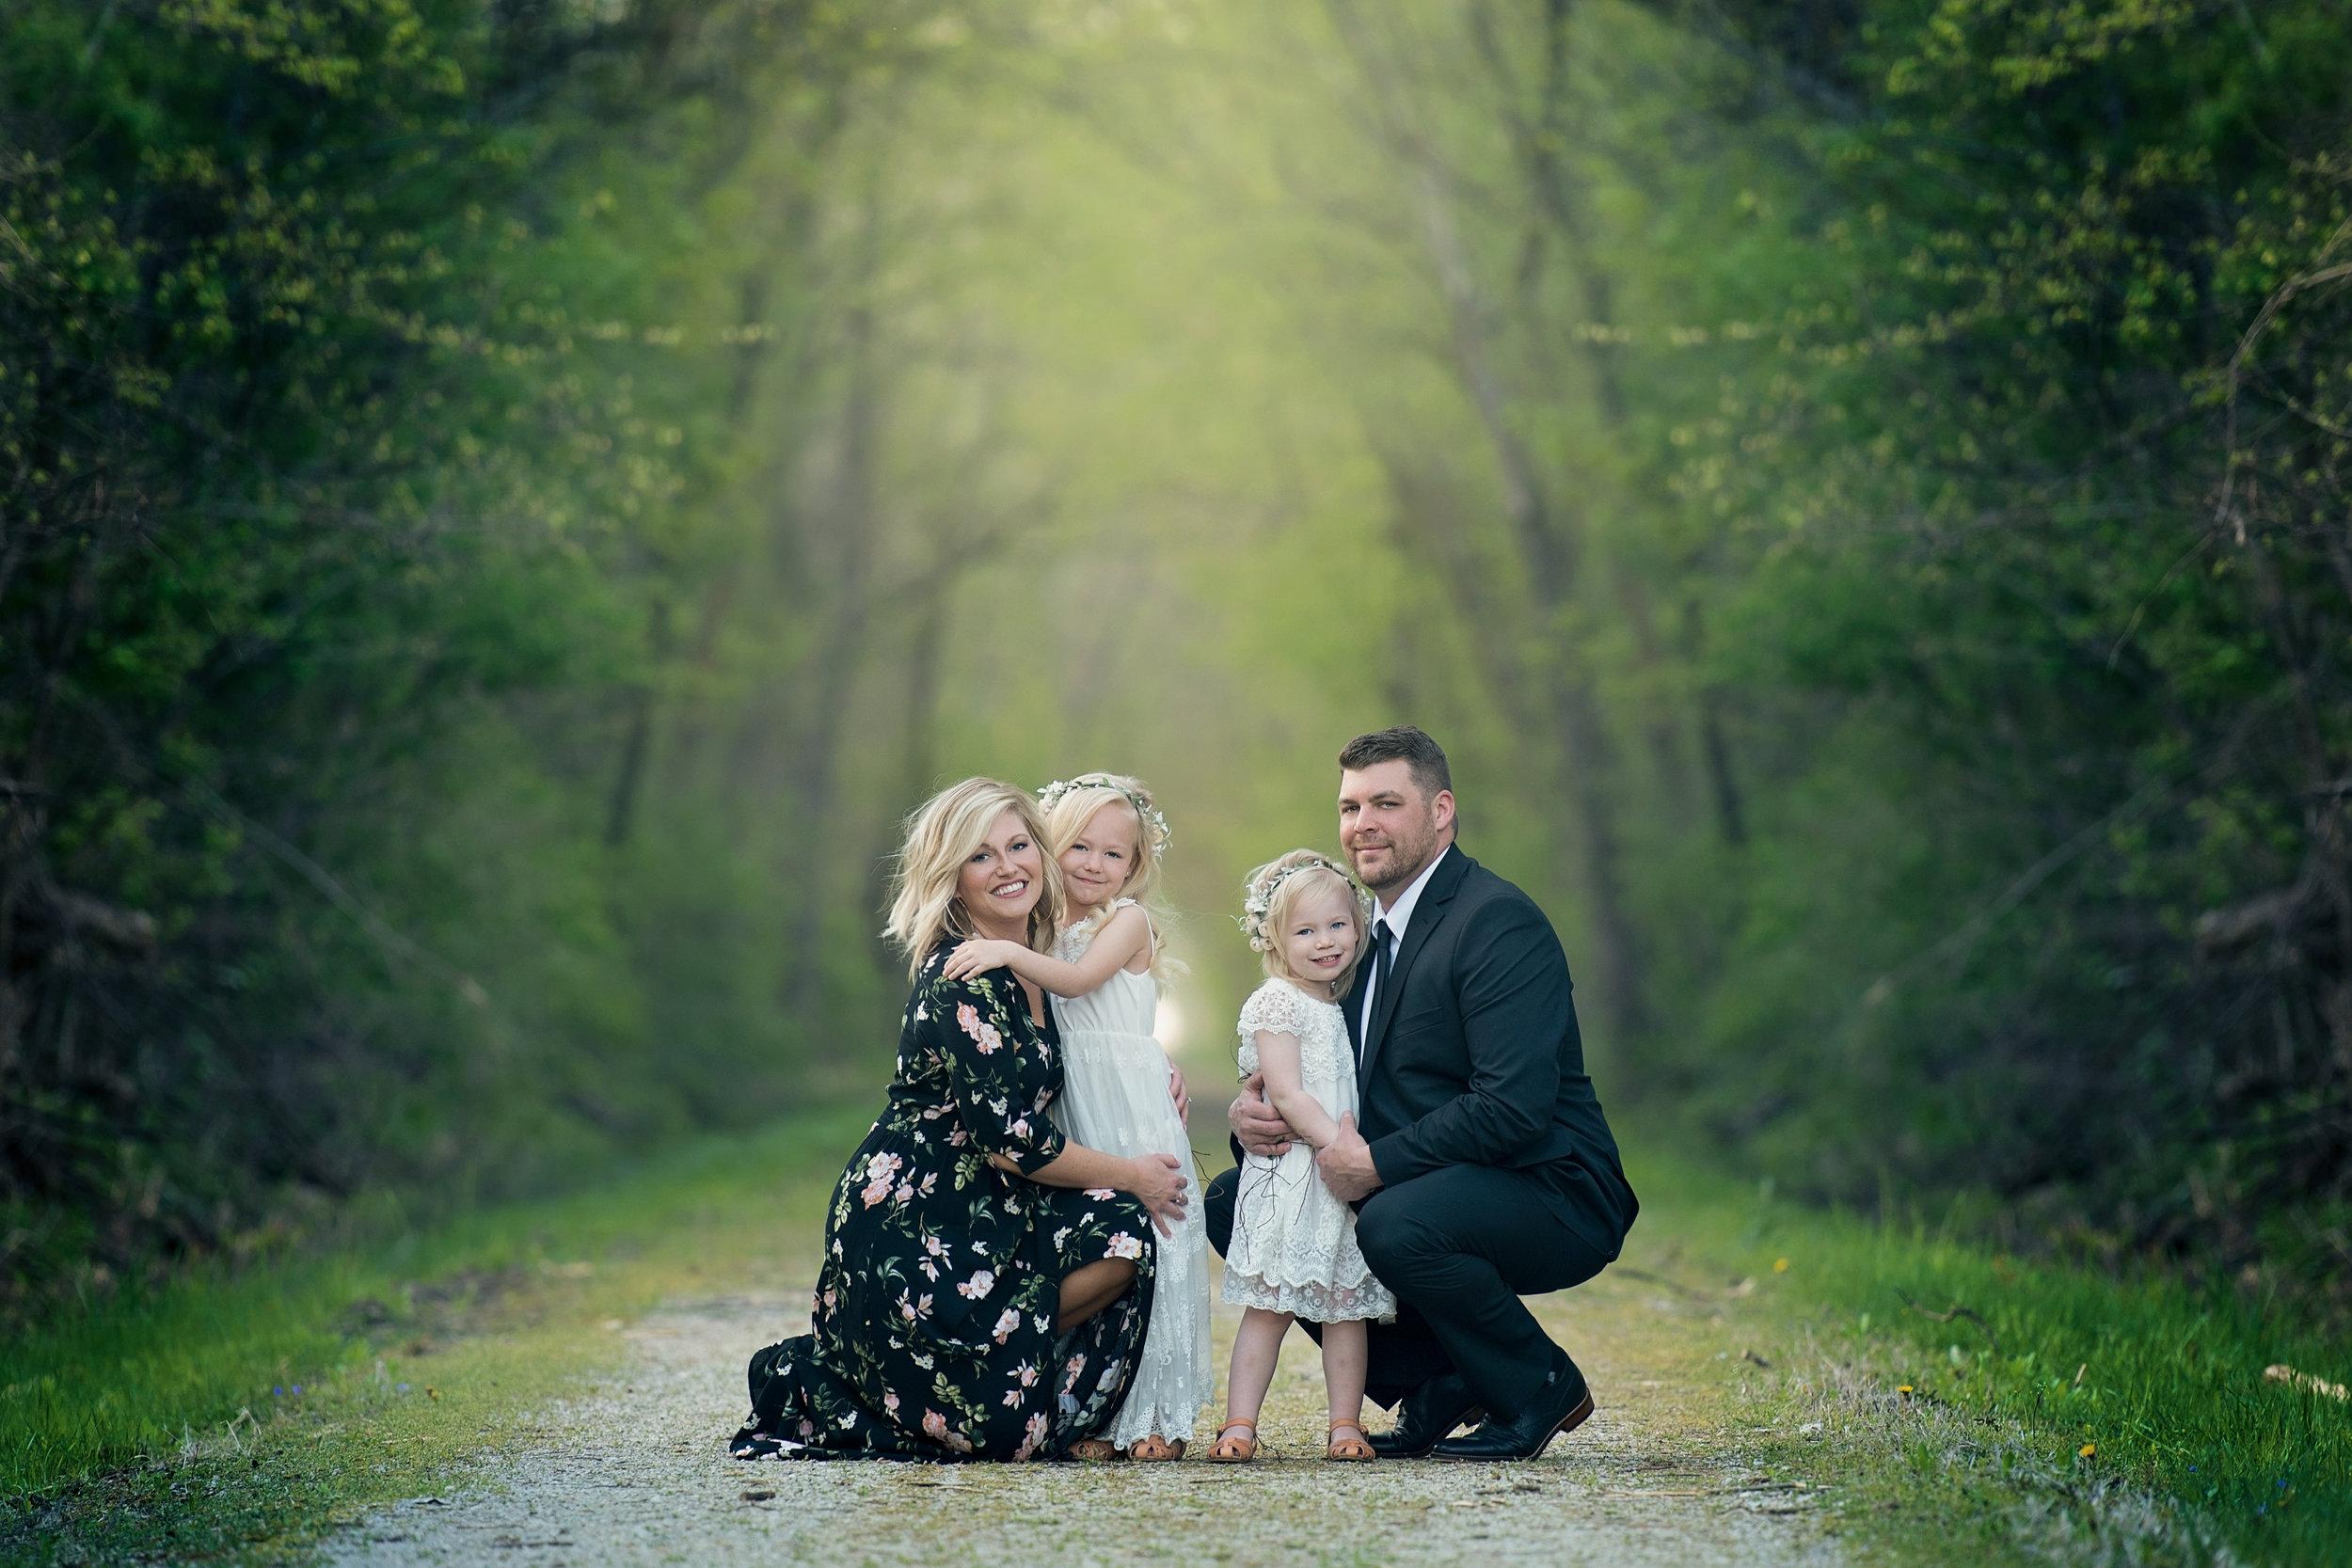 Miklo Family May 2019 2.jpg